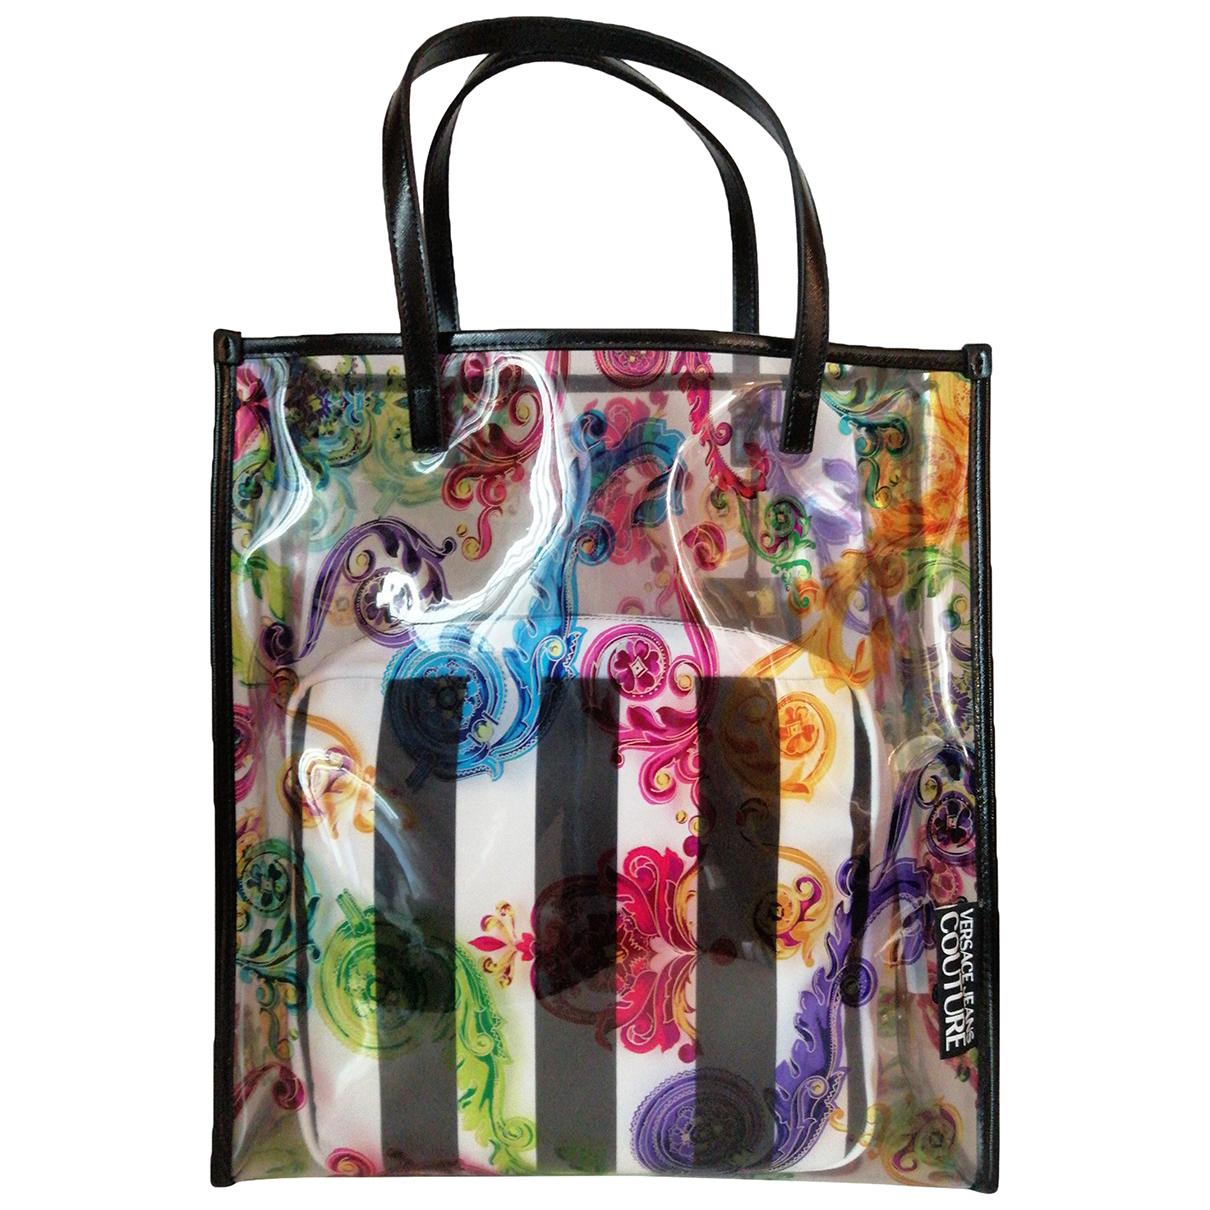 Versace Jeans \N Multicolour handbag for Women \N